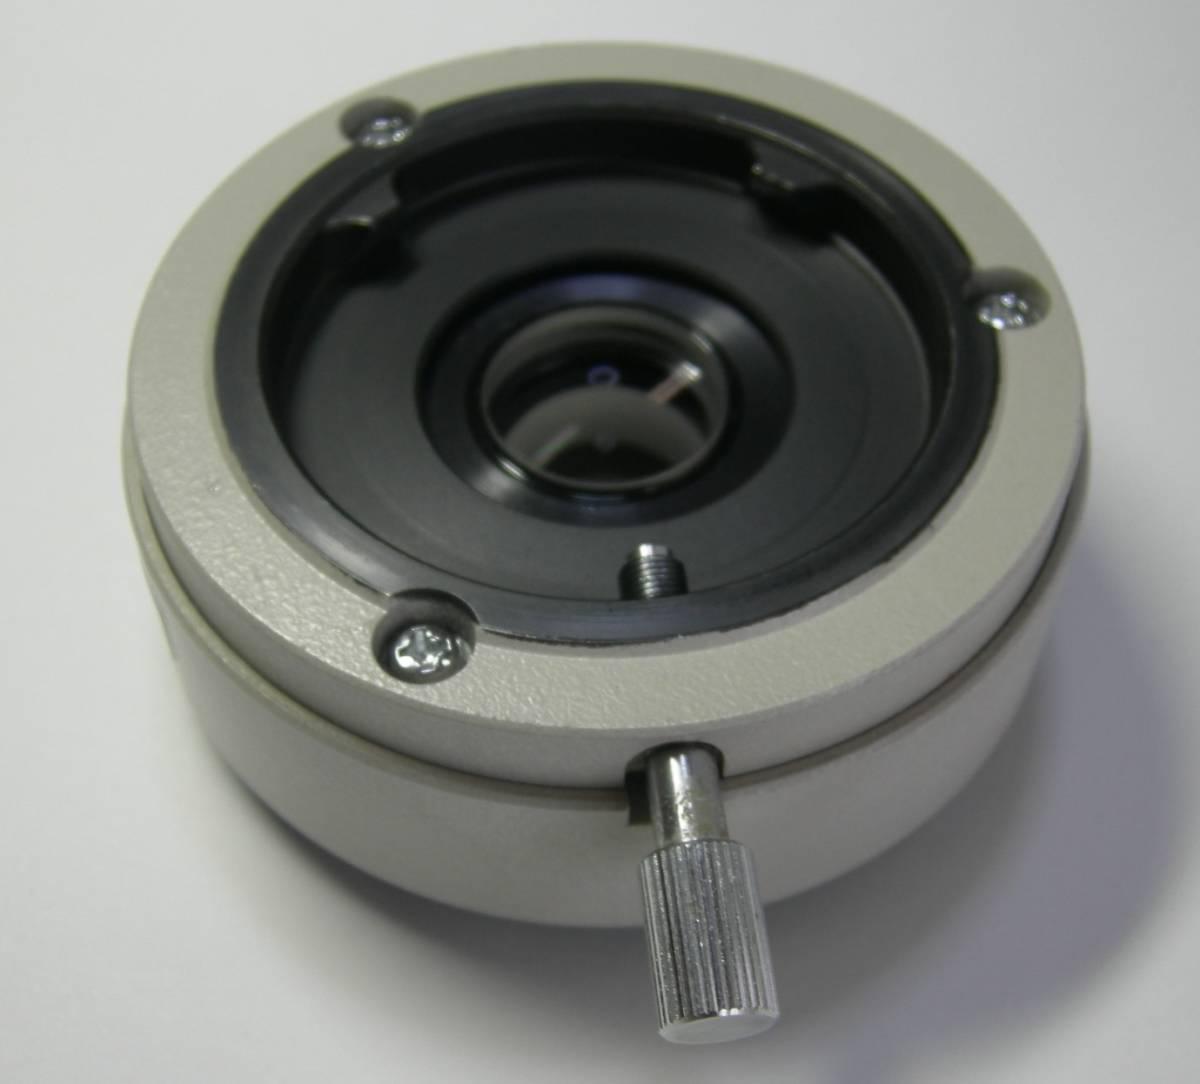 Microscope Japan 返品保証 ニコン Nikon アイレベルライザー Eye Level Riser  Optiphot、Optiphot2、Labophot、Labophot2用 中古 _画像3